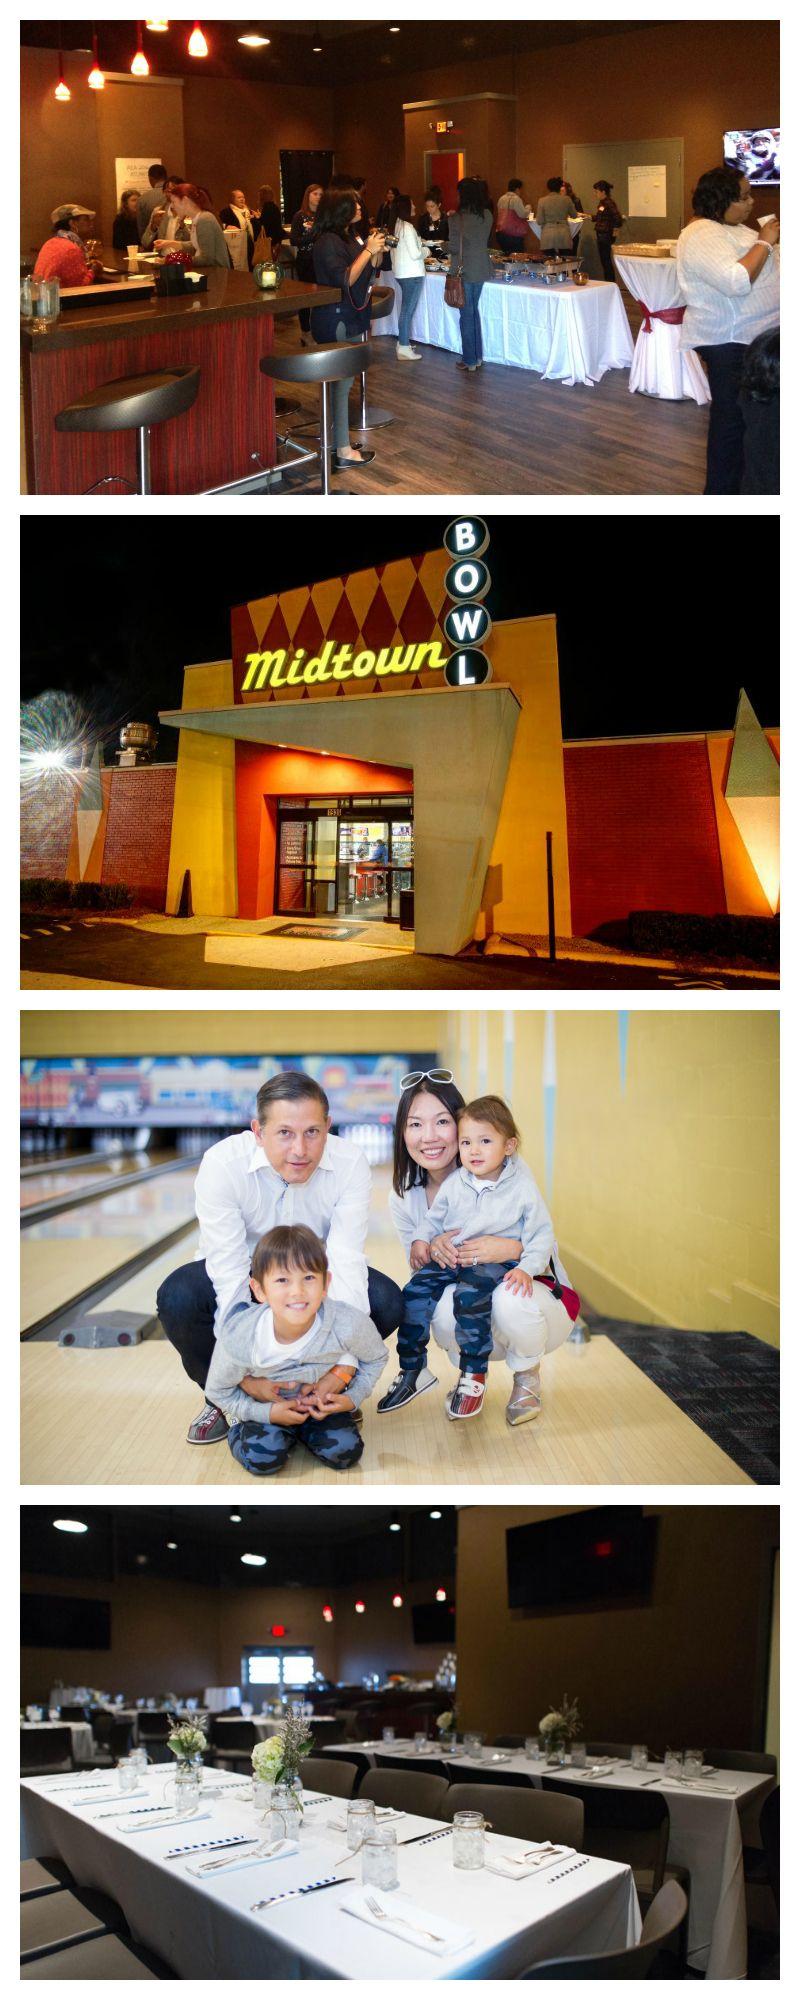 Midtown Bowl is Atlanta's favorite bowling party